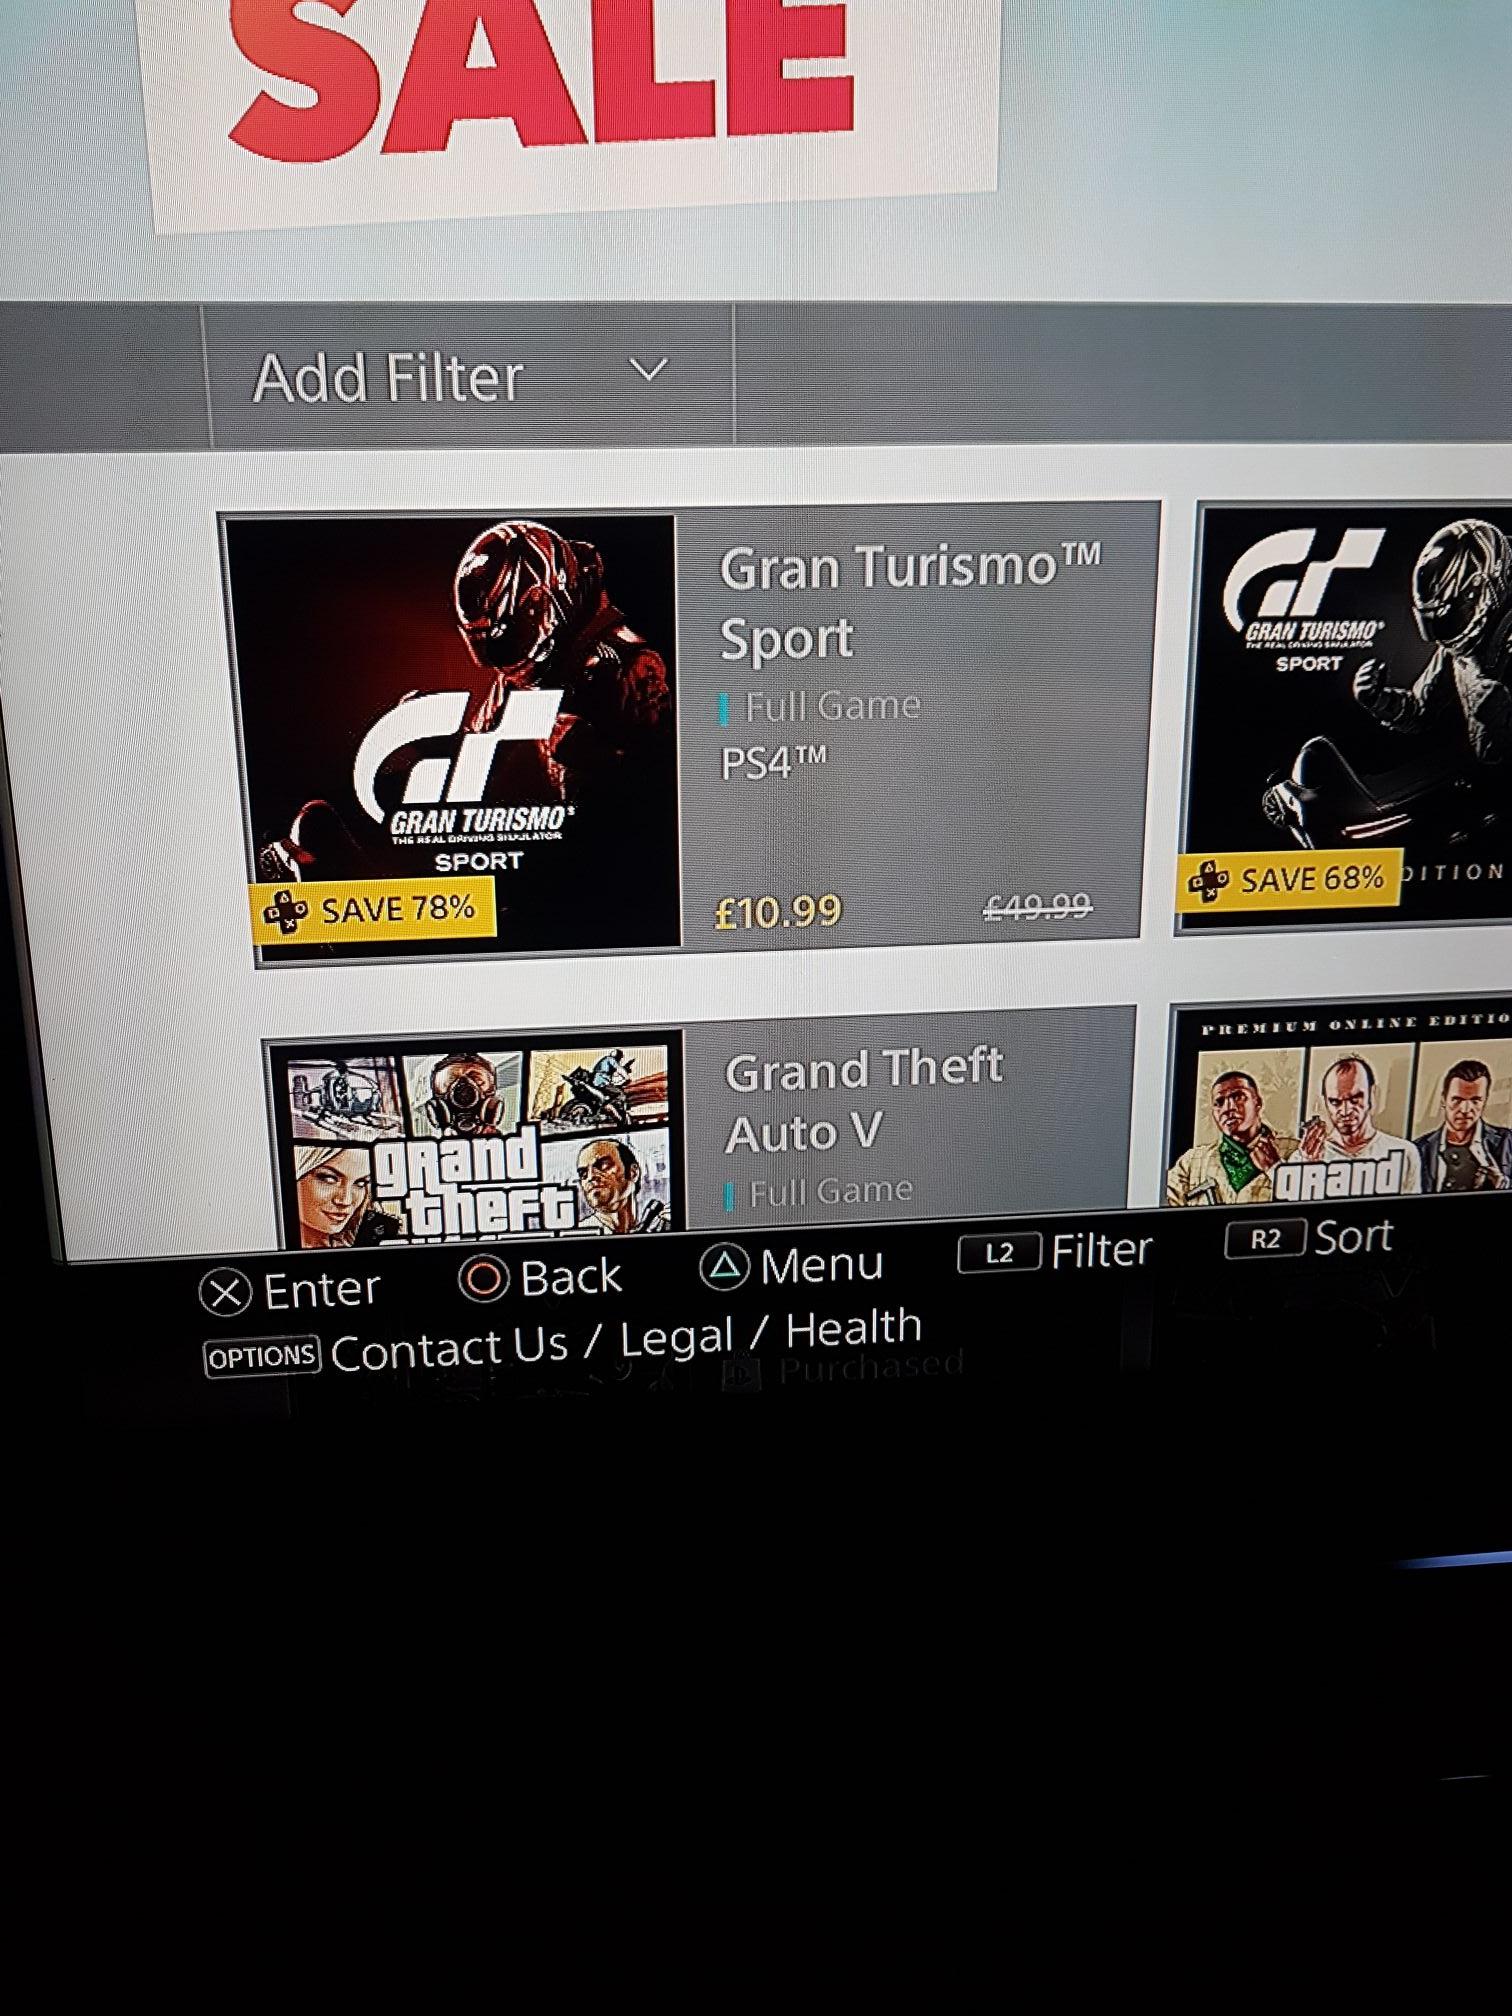 PS4 Gran Turismo Sport - £10.99 @ PSN (ps+)